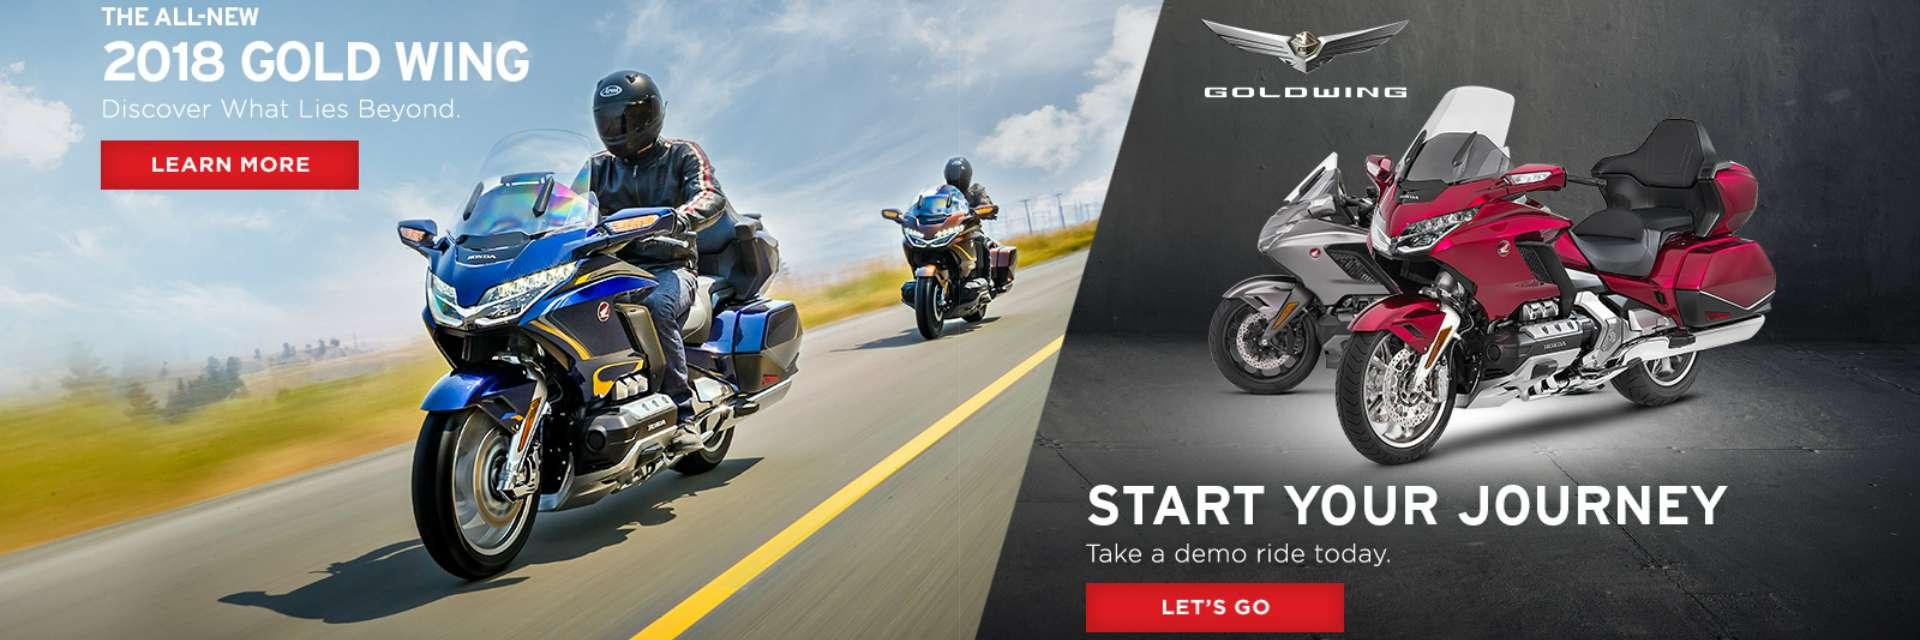 DeSoto Honda in MS | New & Used Honda Motorcycles, ATVs